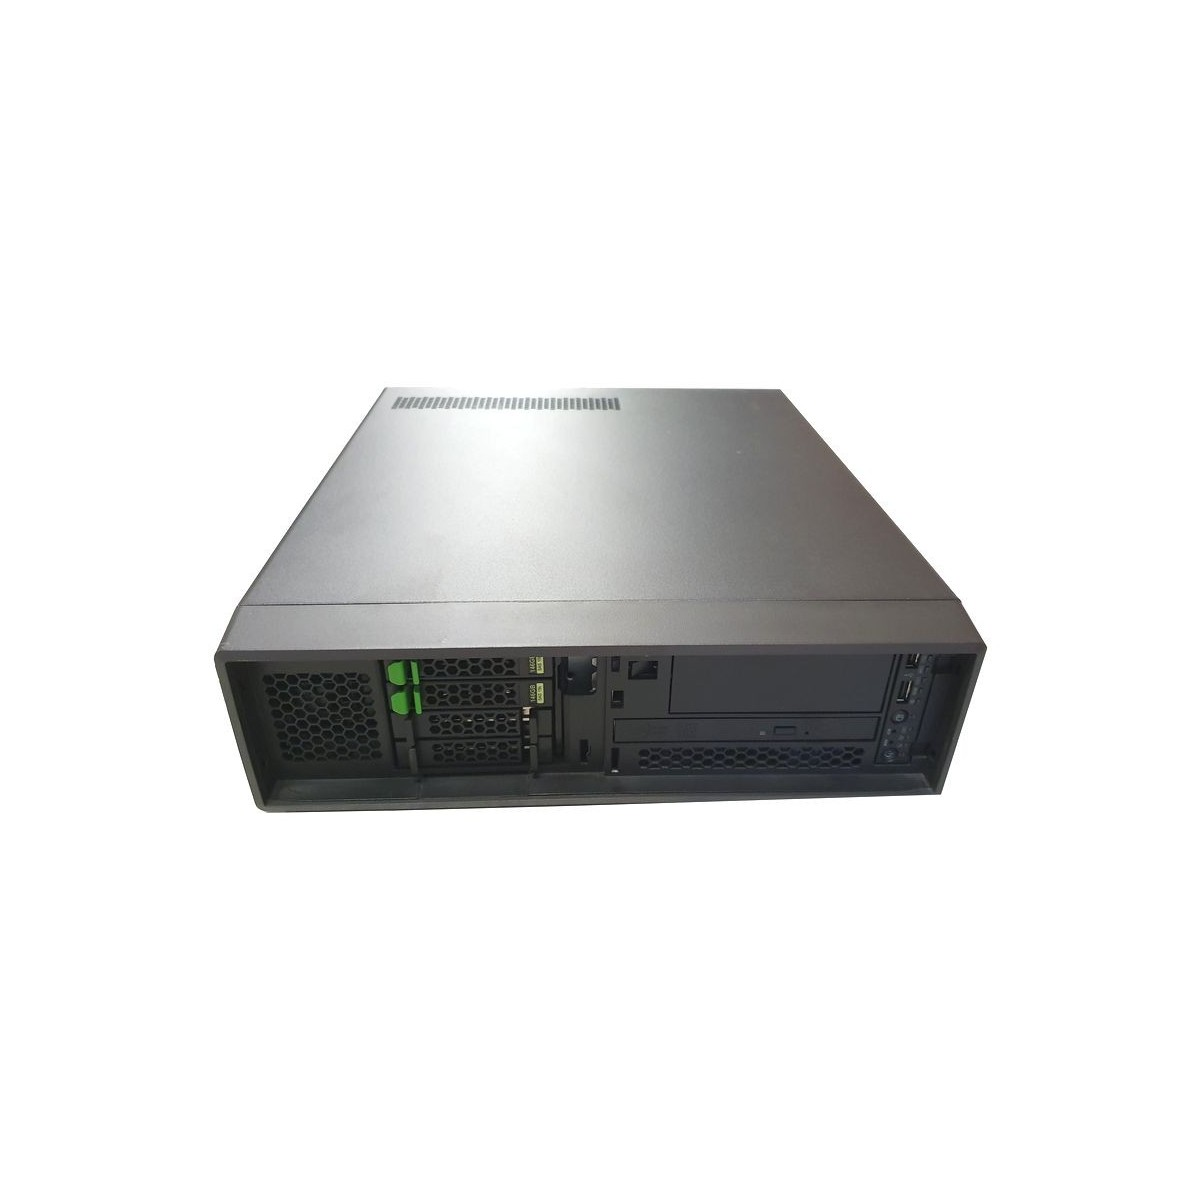 ServeRAID M5100 Series 512MB RAID 5 BATERIA